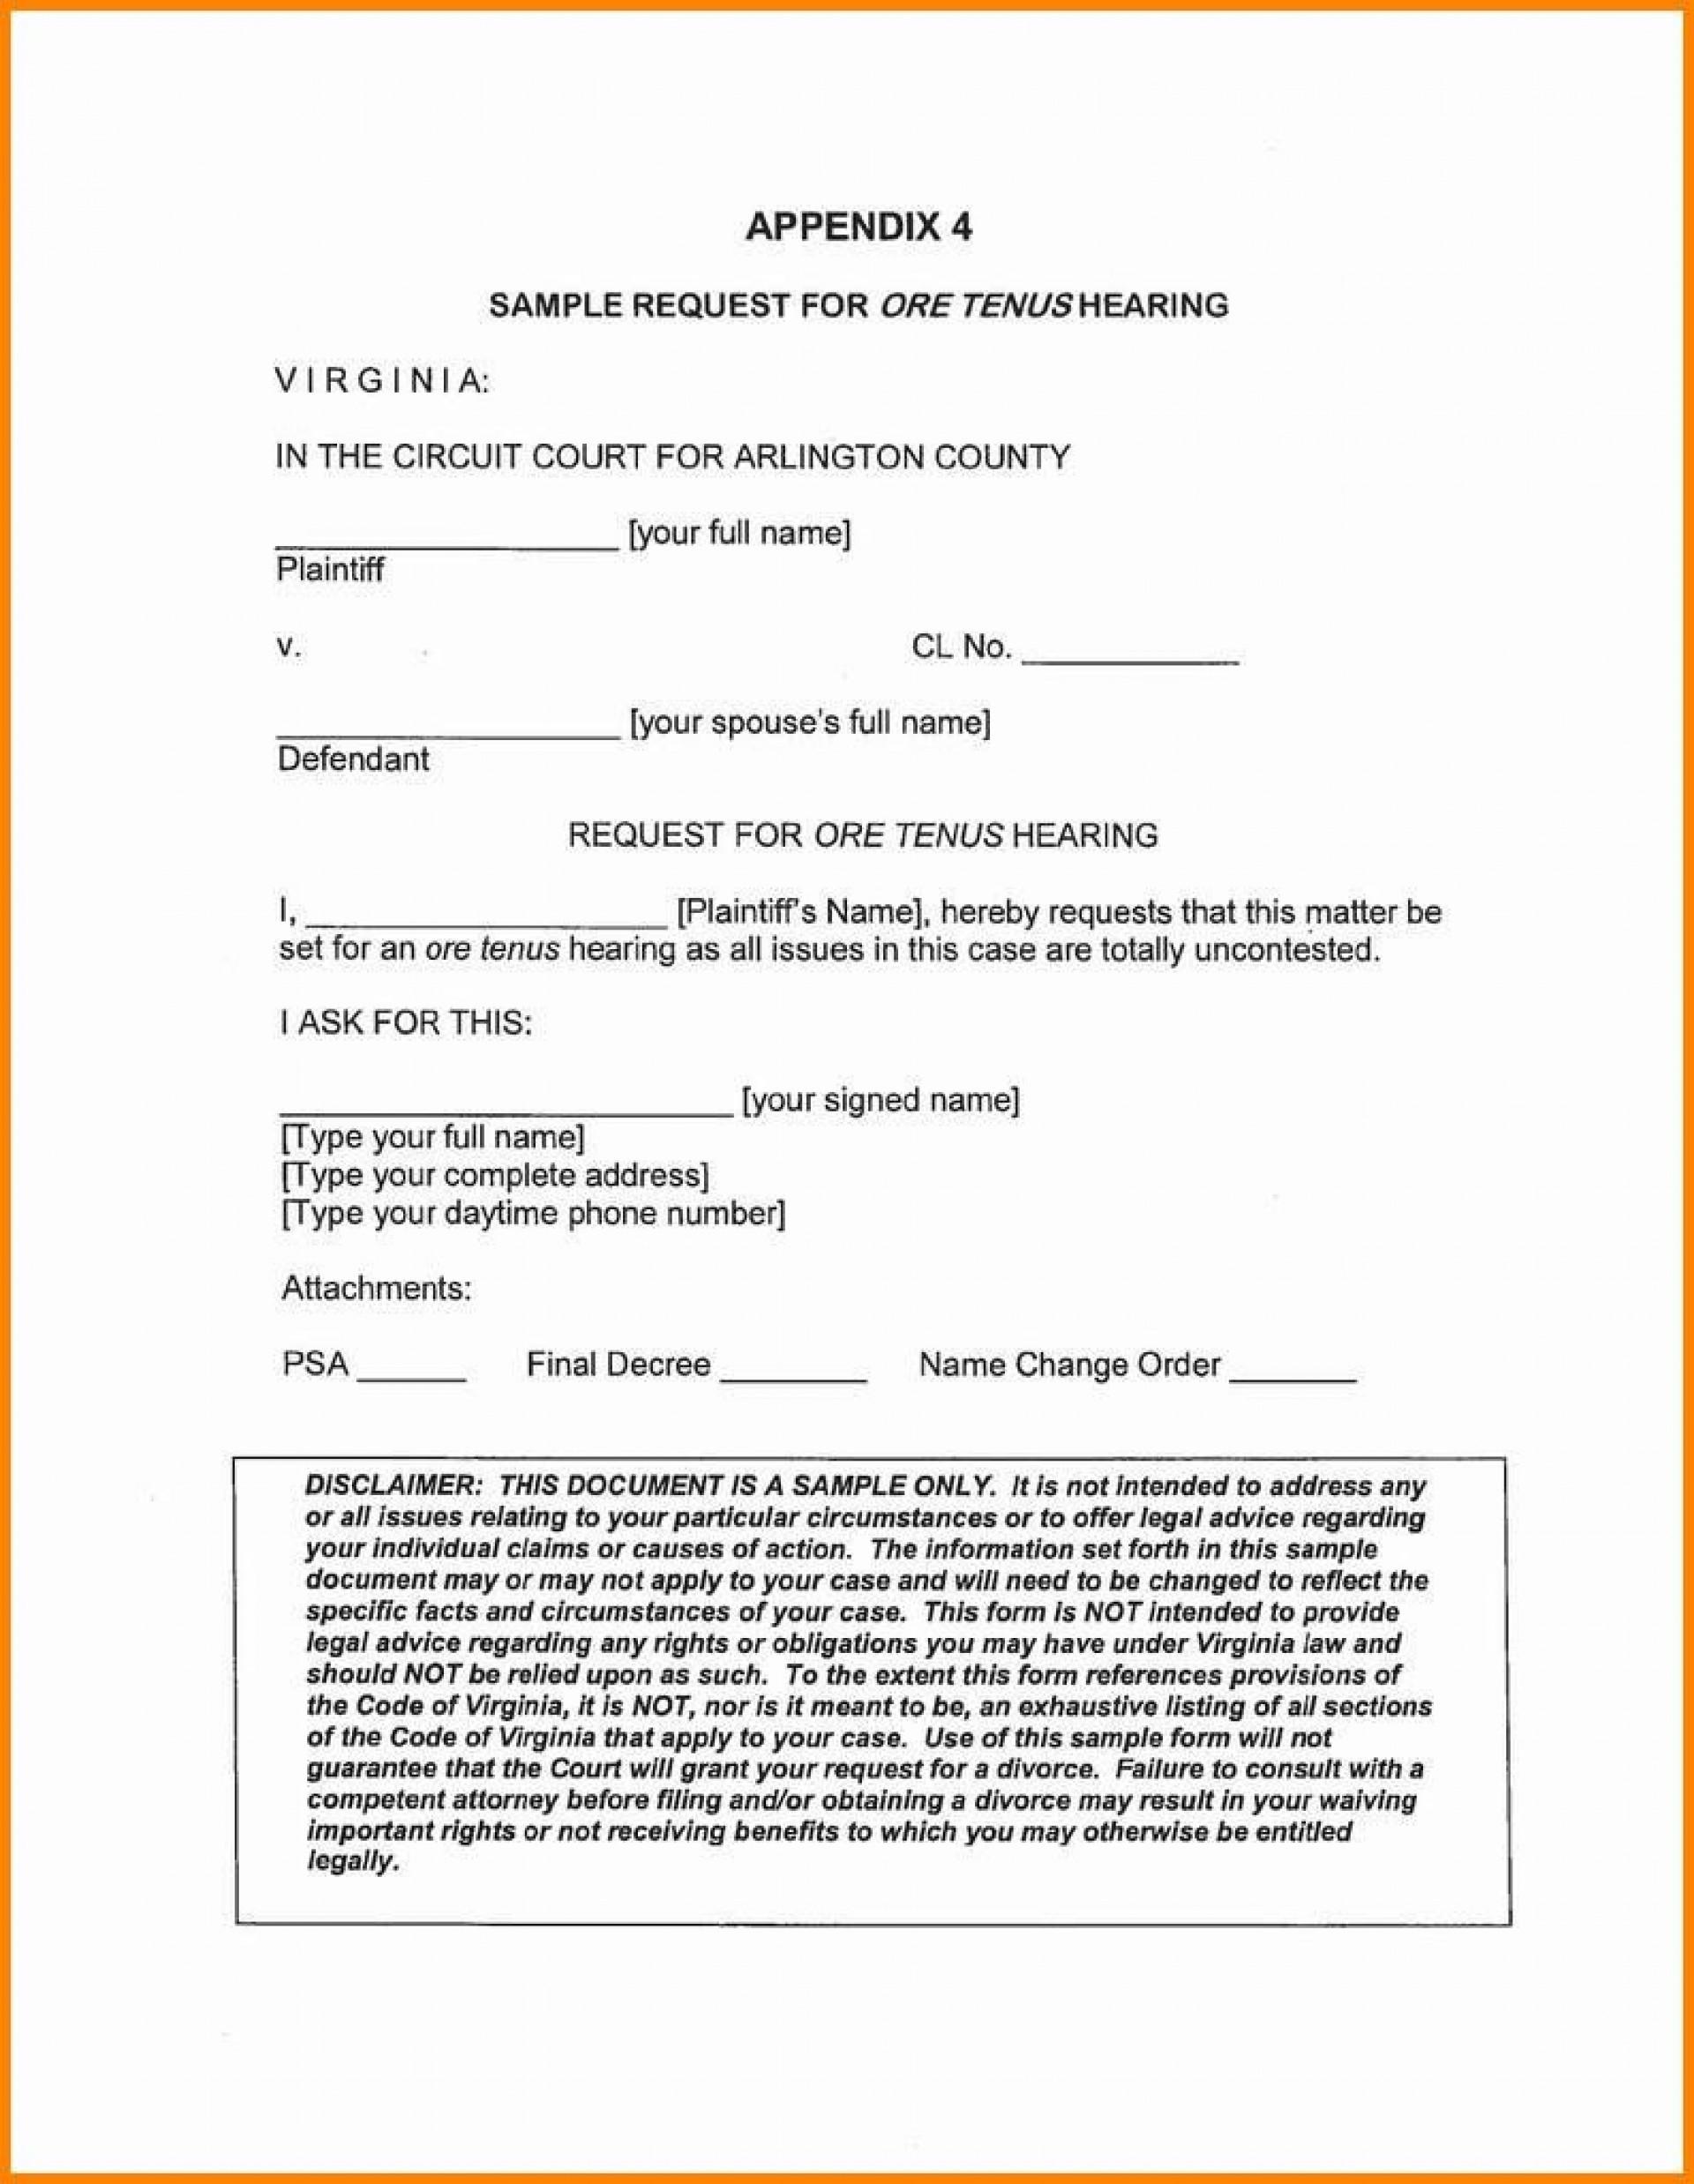 009 Beautiful Virginia Separation Agreement Template High Def  Marital Marriage1920